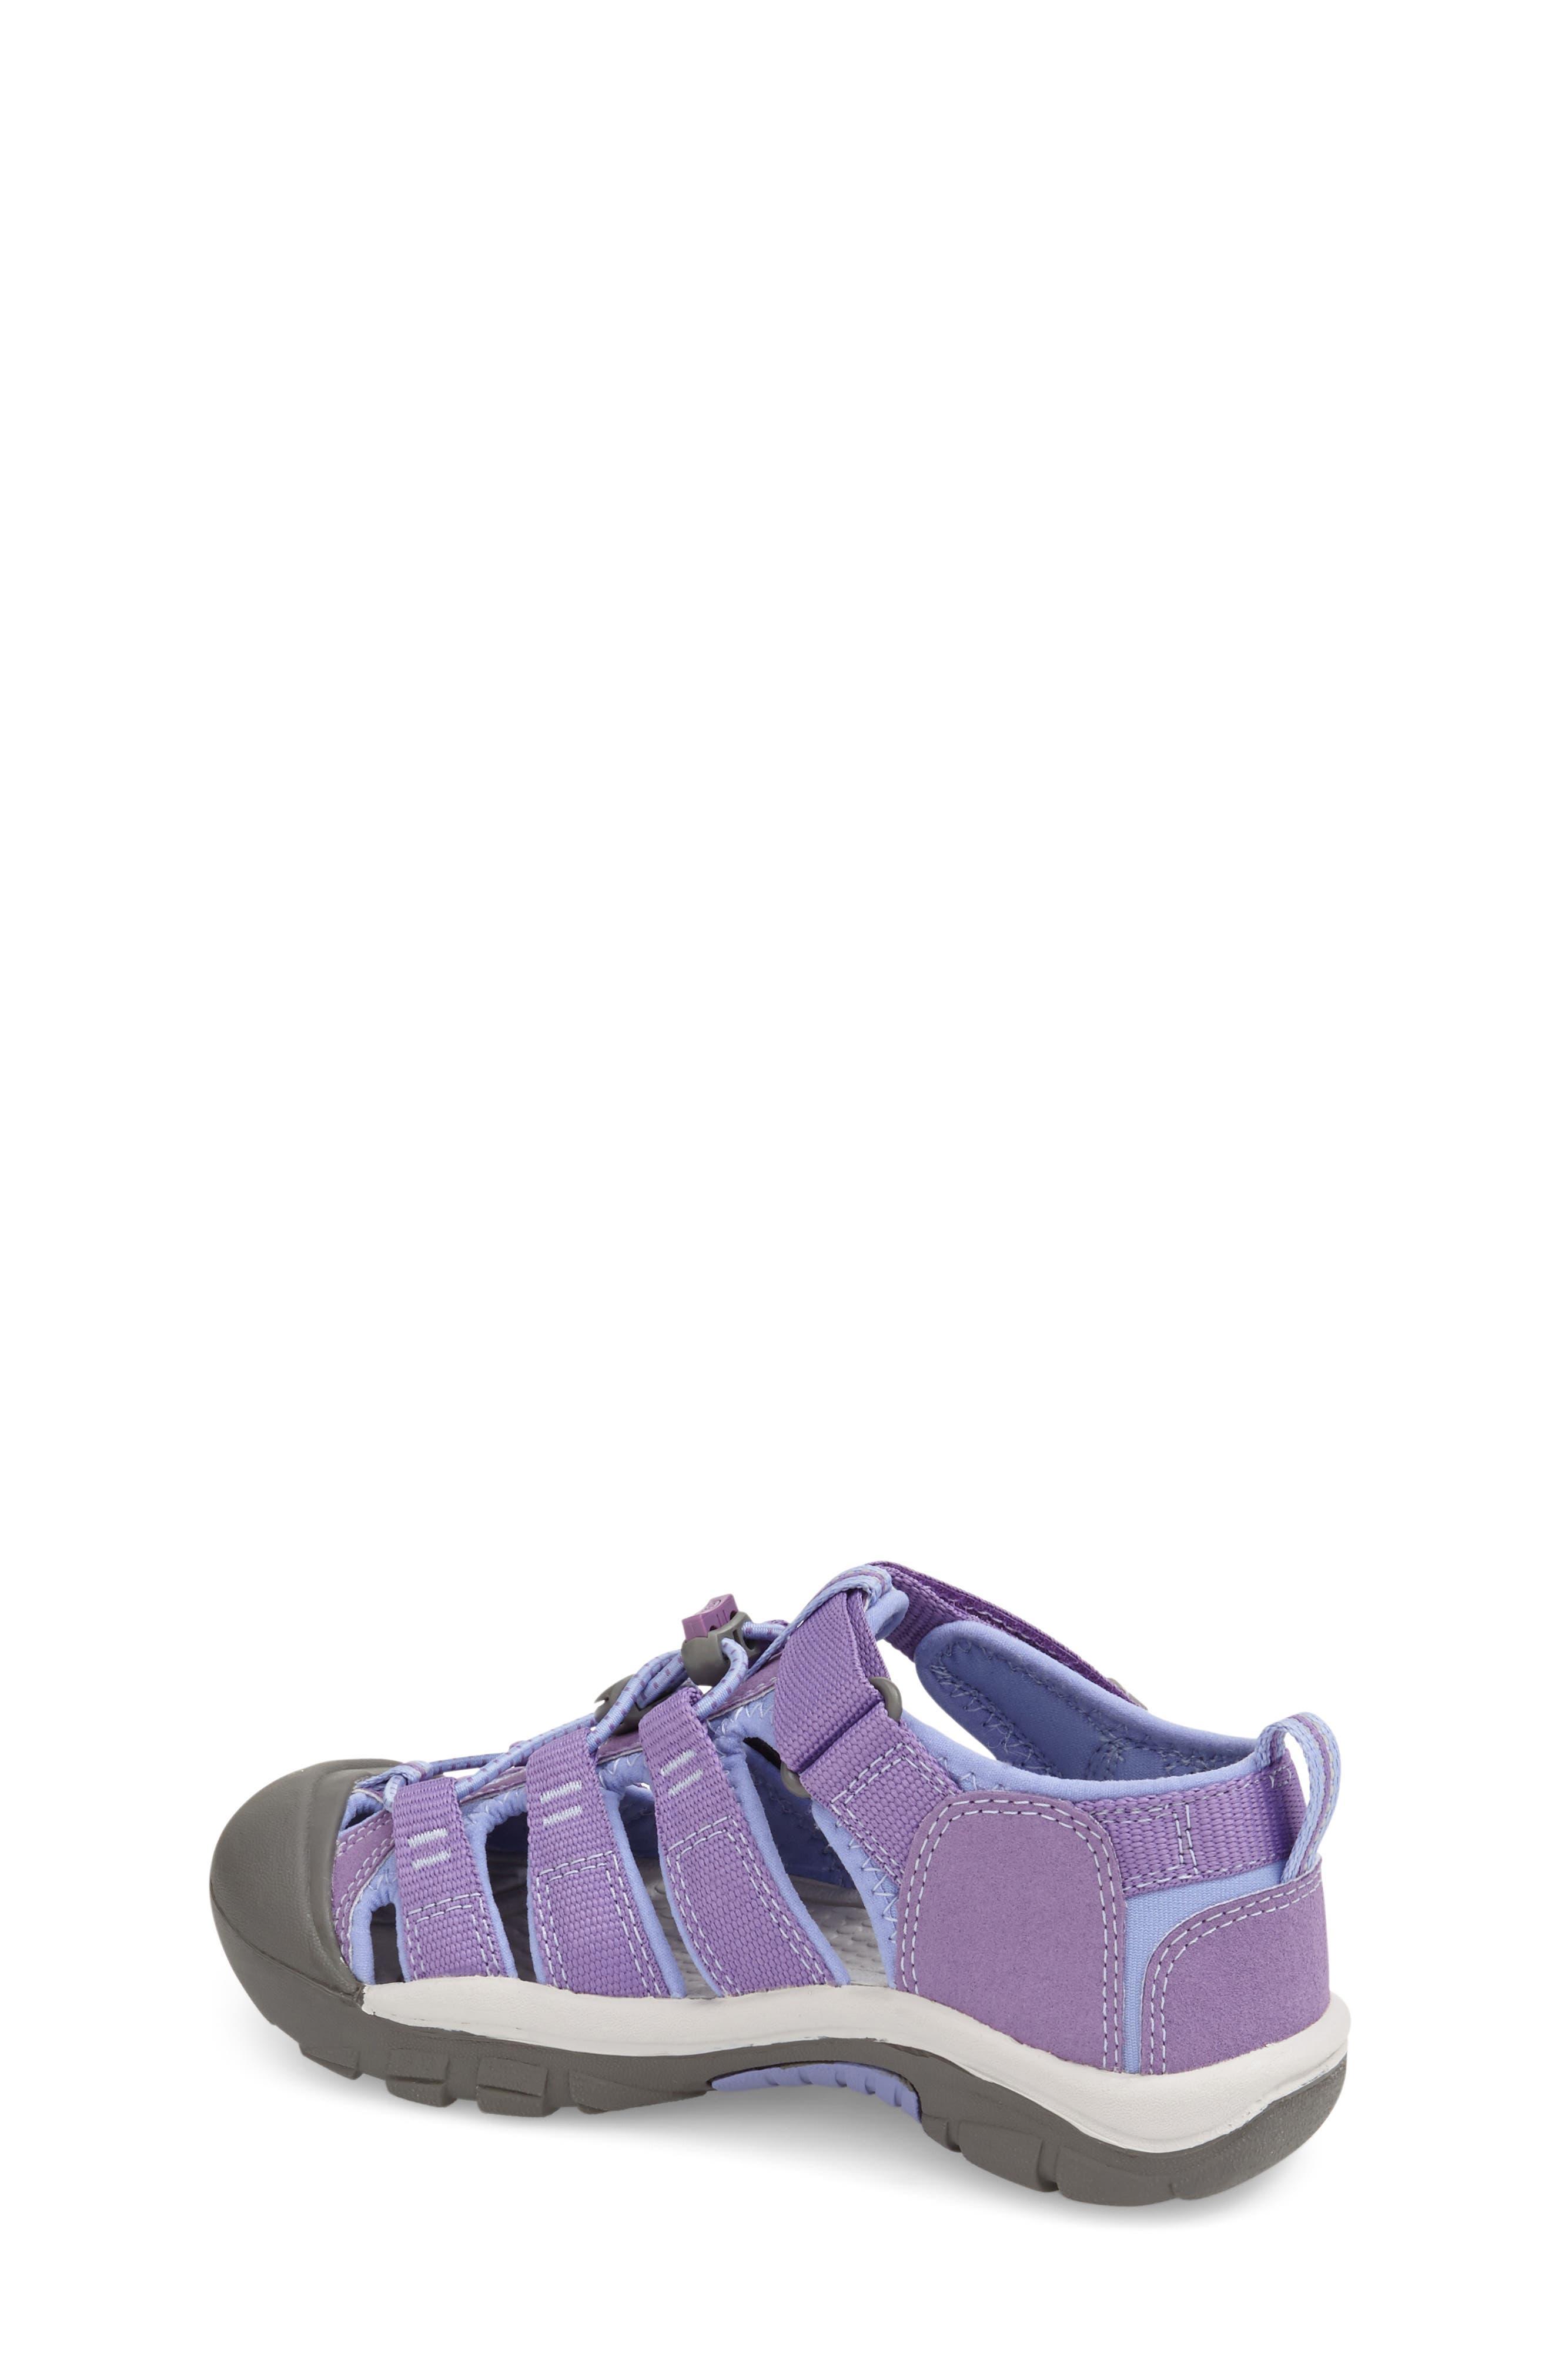 'Newport H2' Water Friendly Sandal,                             Alternate thumbnail 101, color,